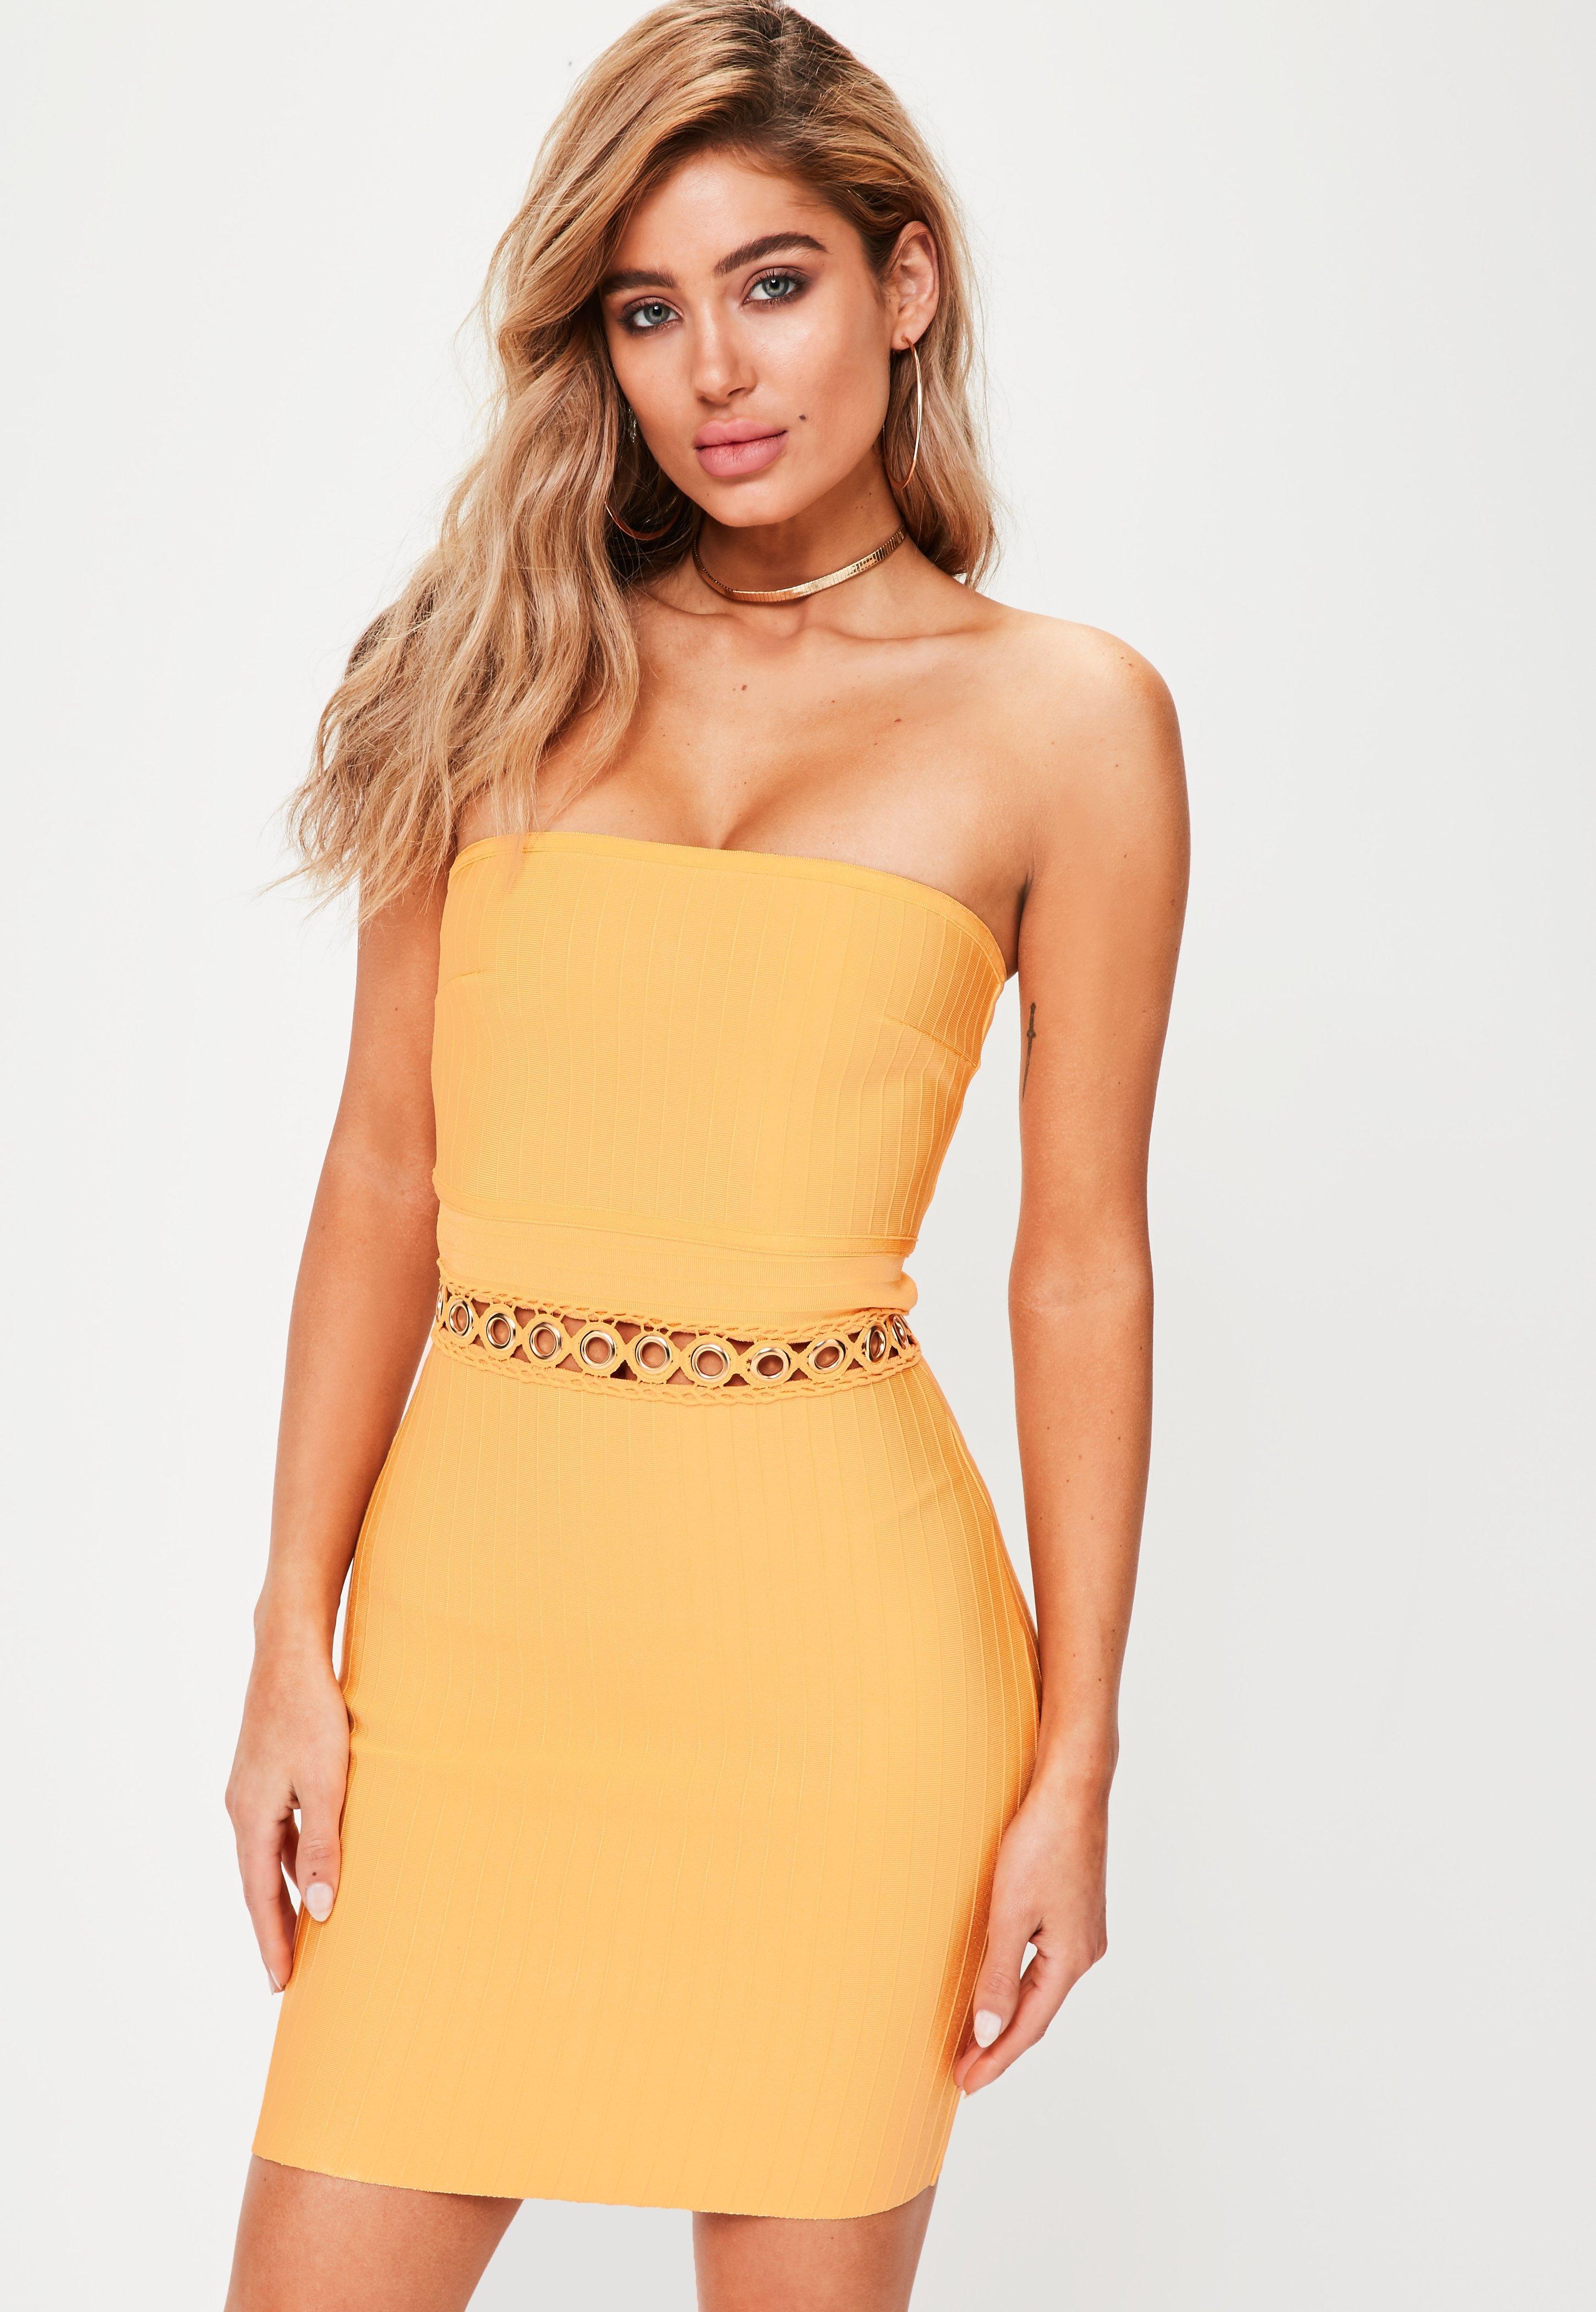 Strapless Dresses Online, Bandeau Dresses - Missguided Australia